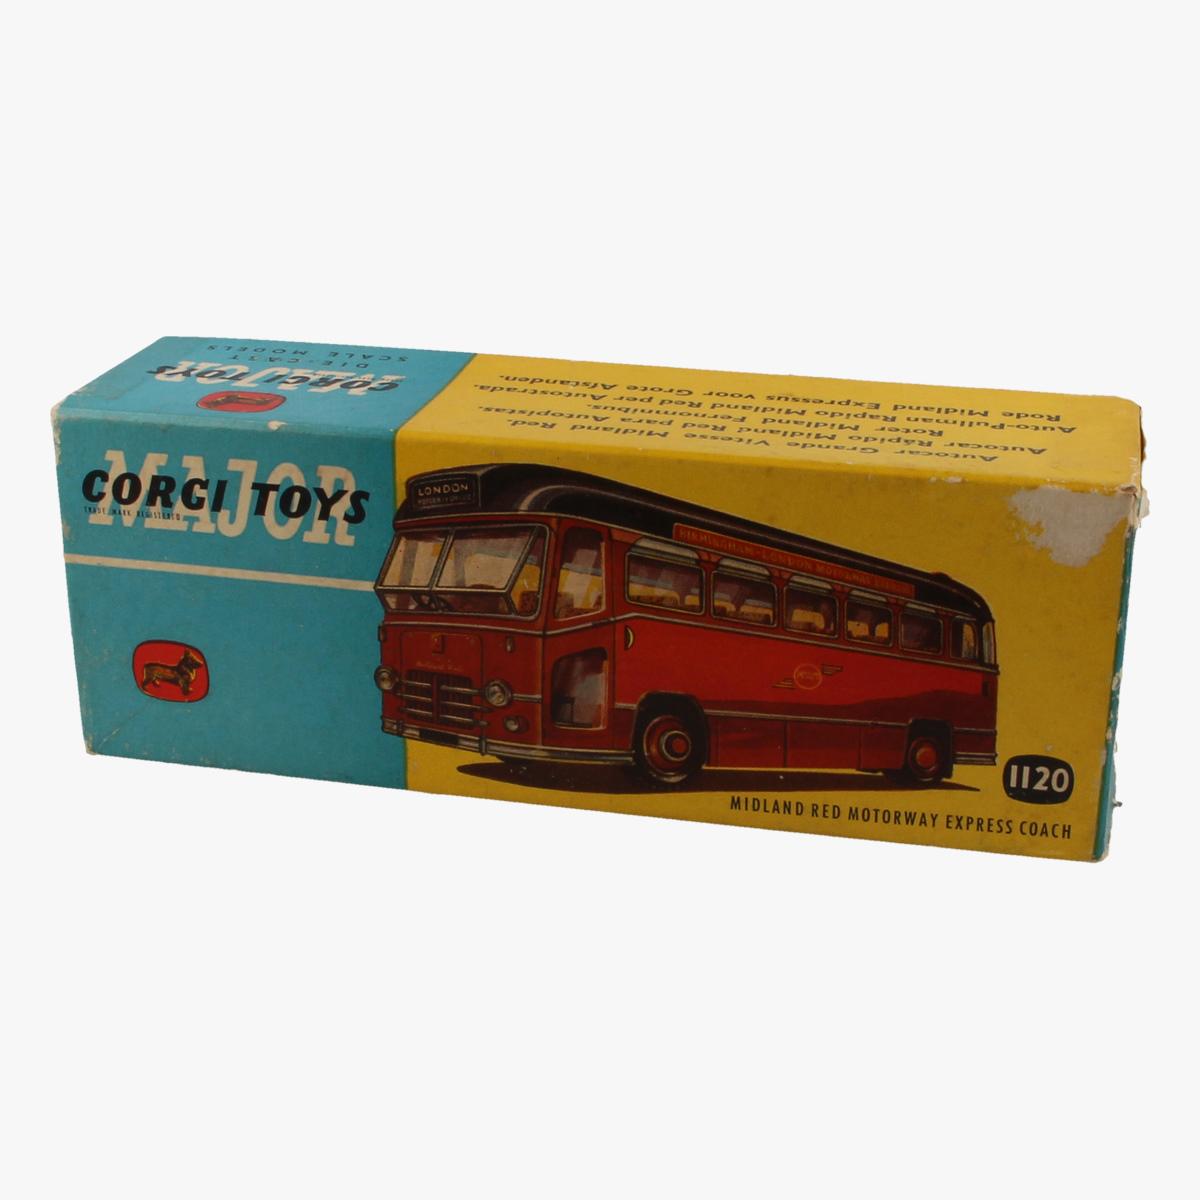 Afbeeldingen van Corgi Toys. Midland Red Motorway Express Coach. Nr.1120